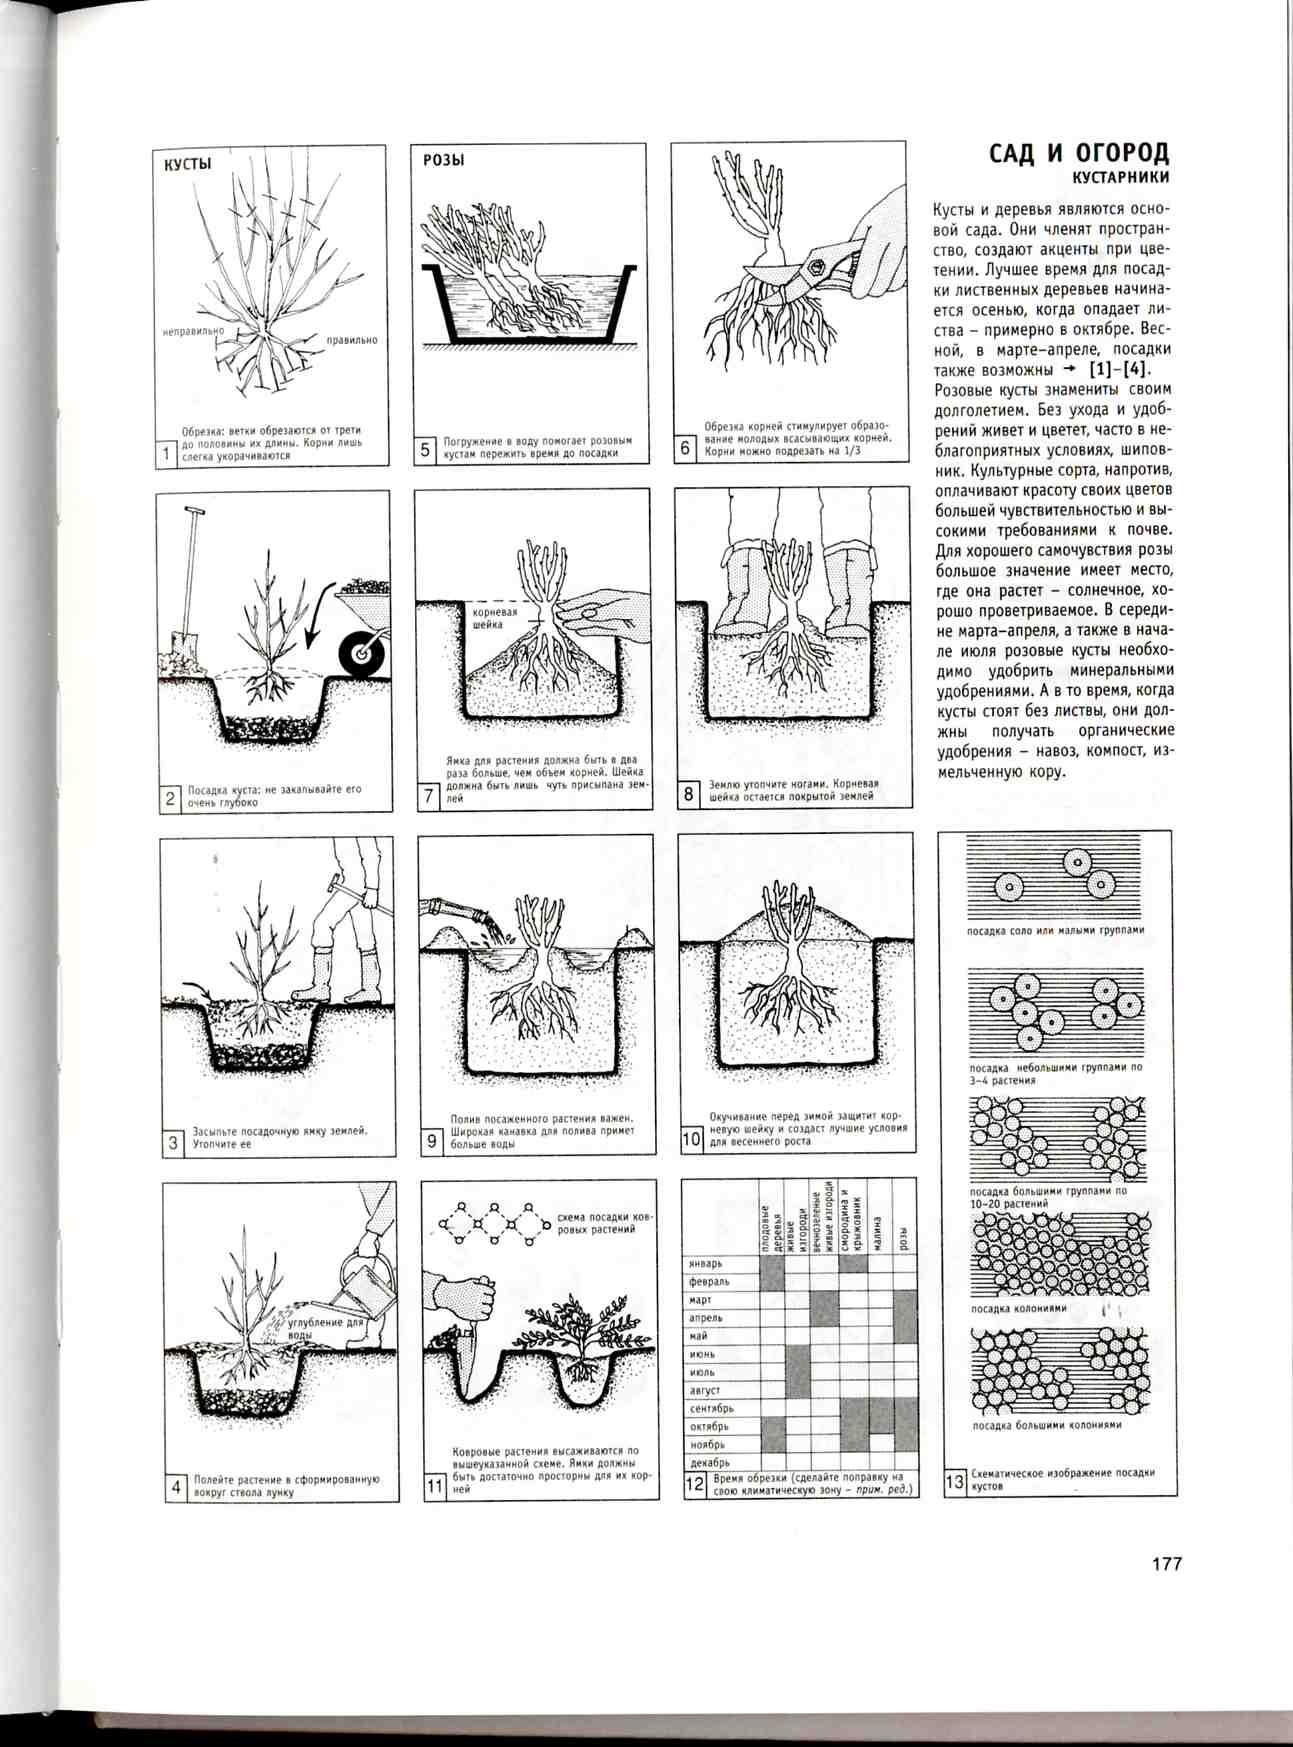 Сад и огород кустарники